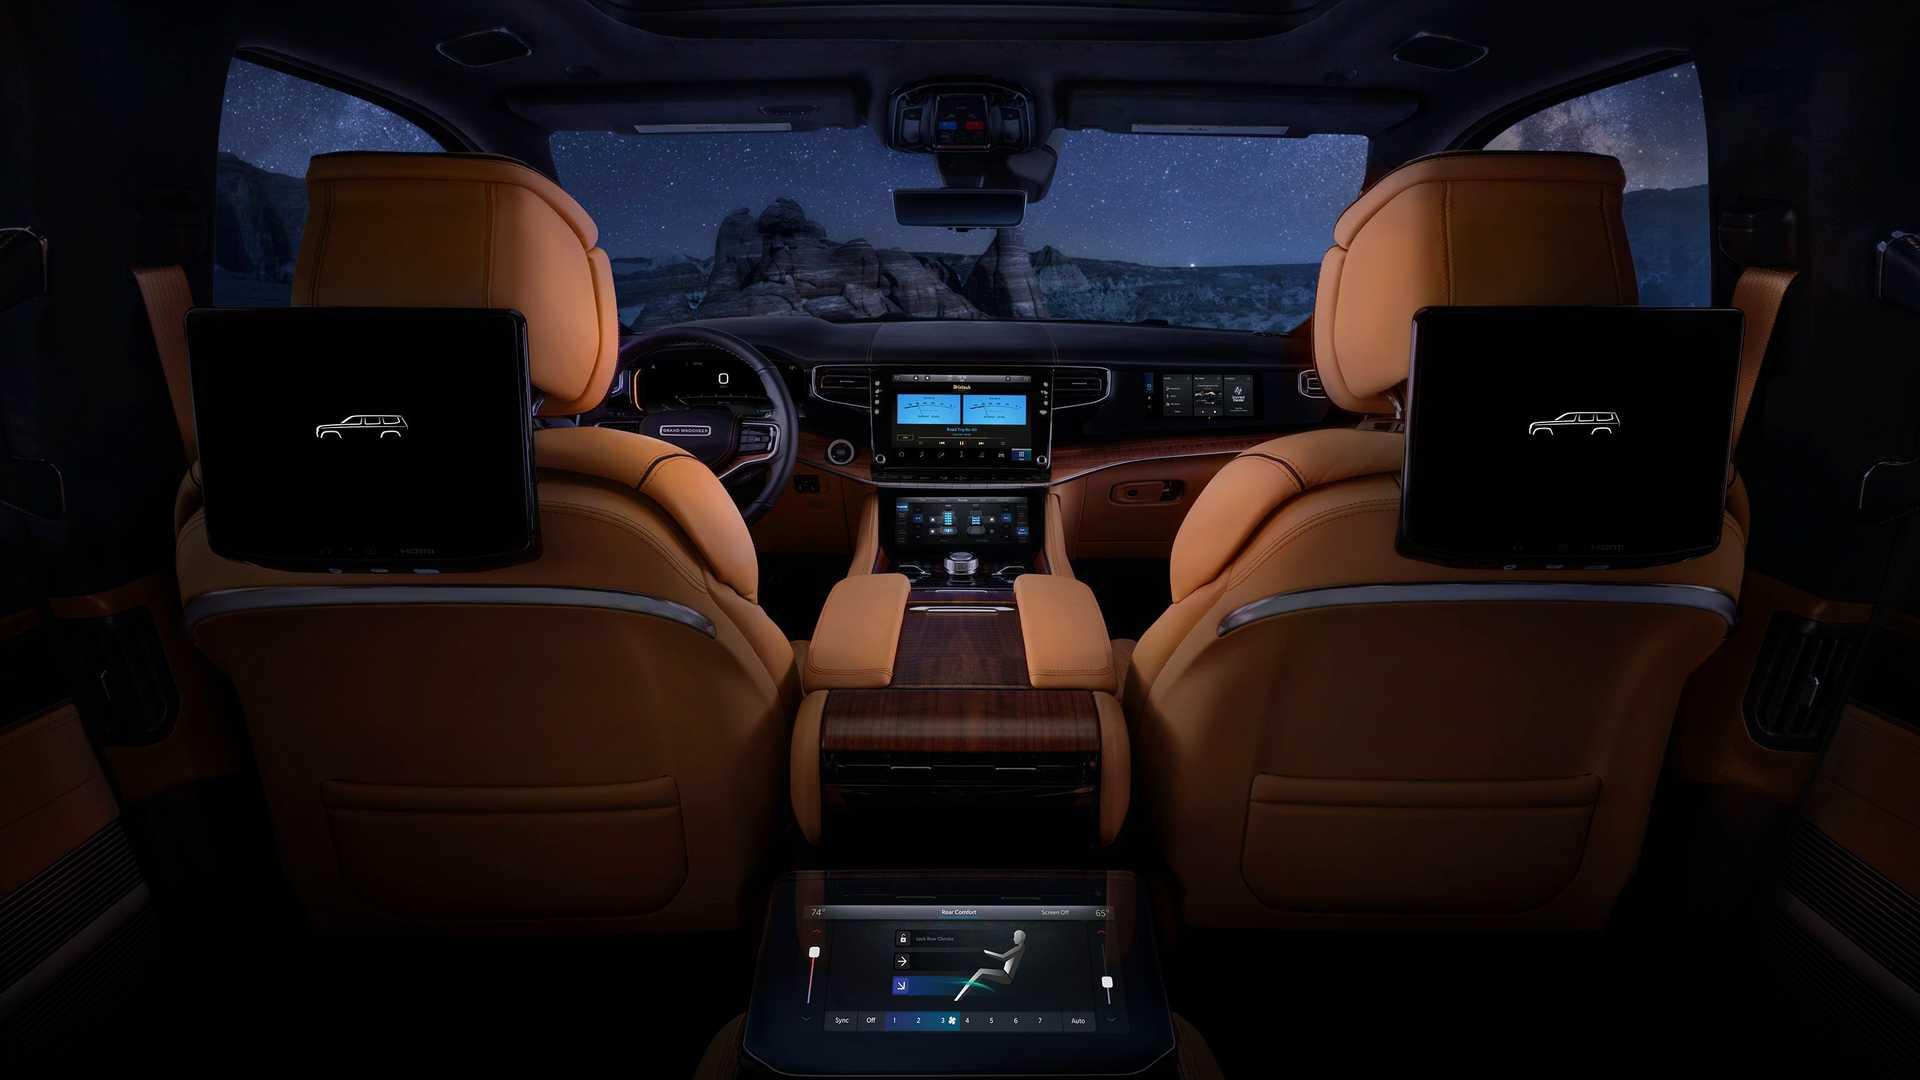 2022-jeep-grand-wagoneer-interior-cabin-1